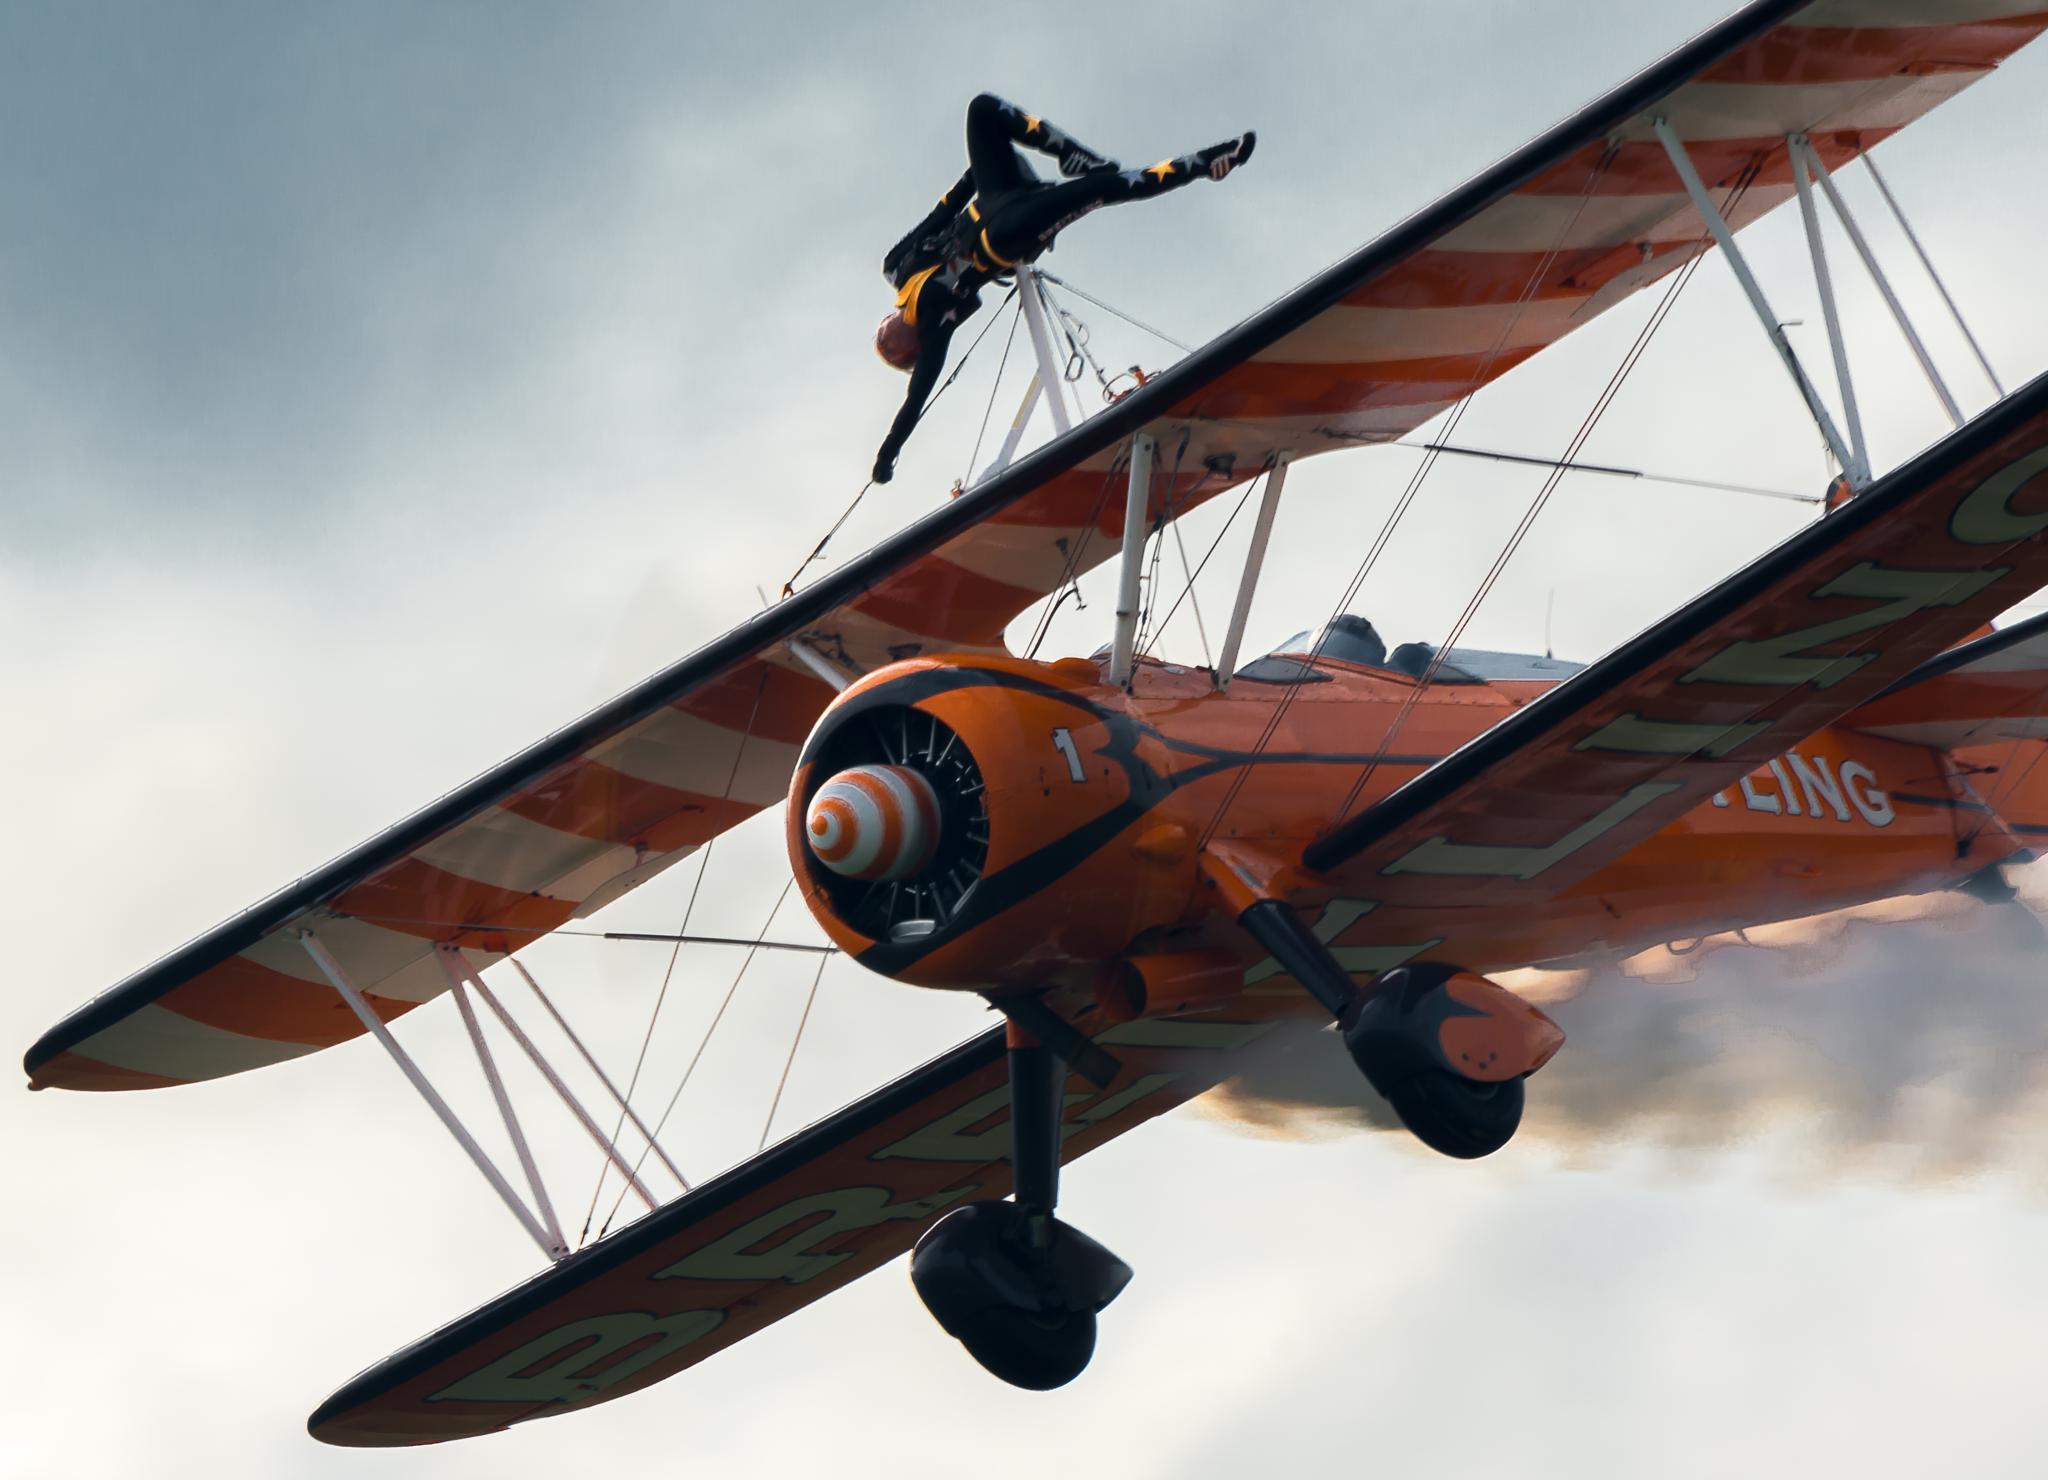 Breitling skywalkers by philippe.lantiez